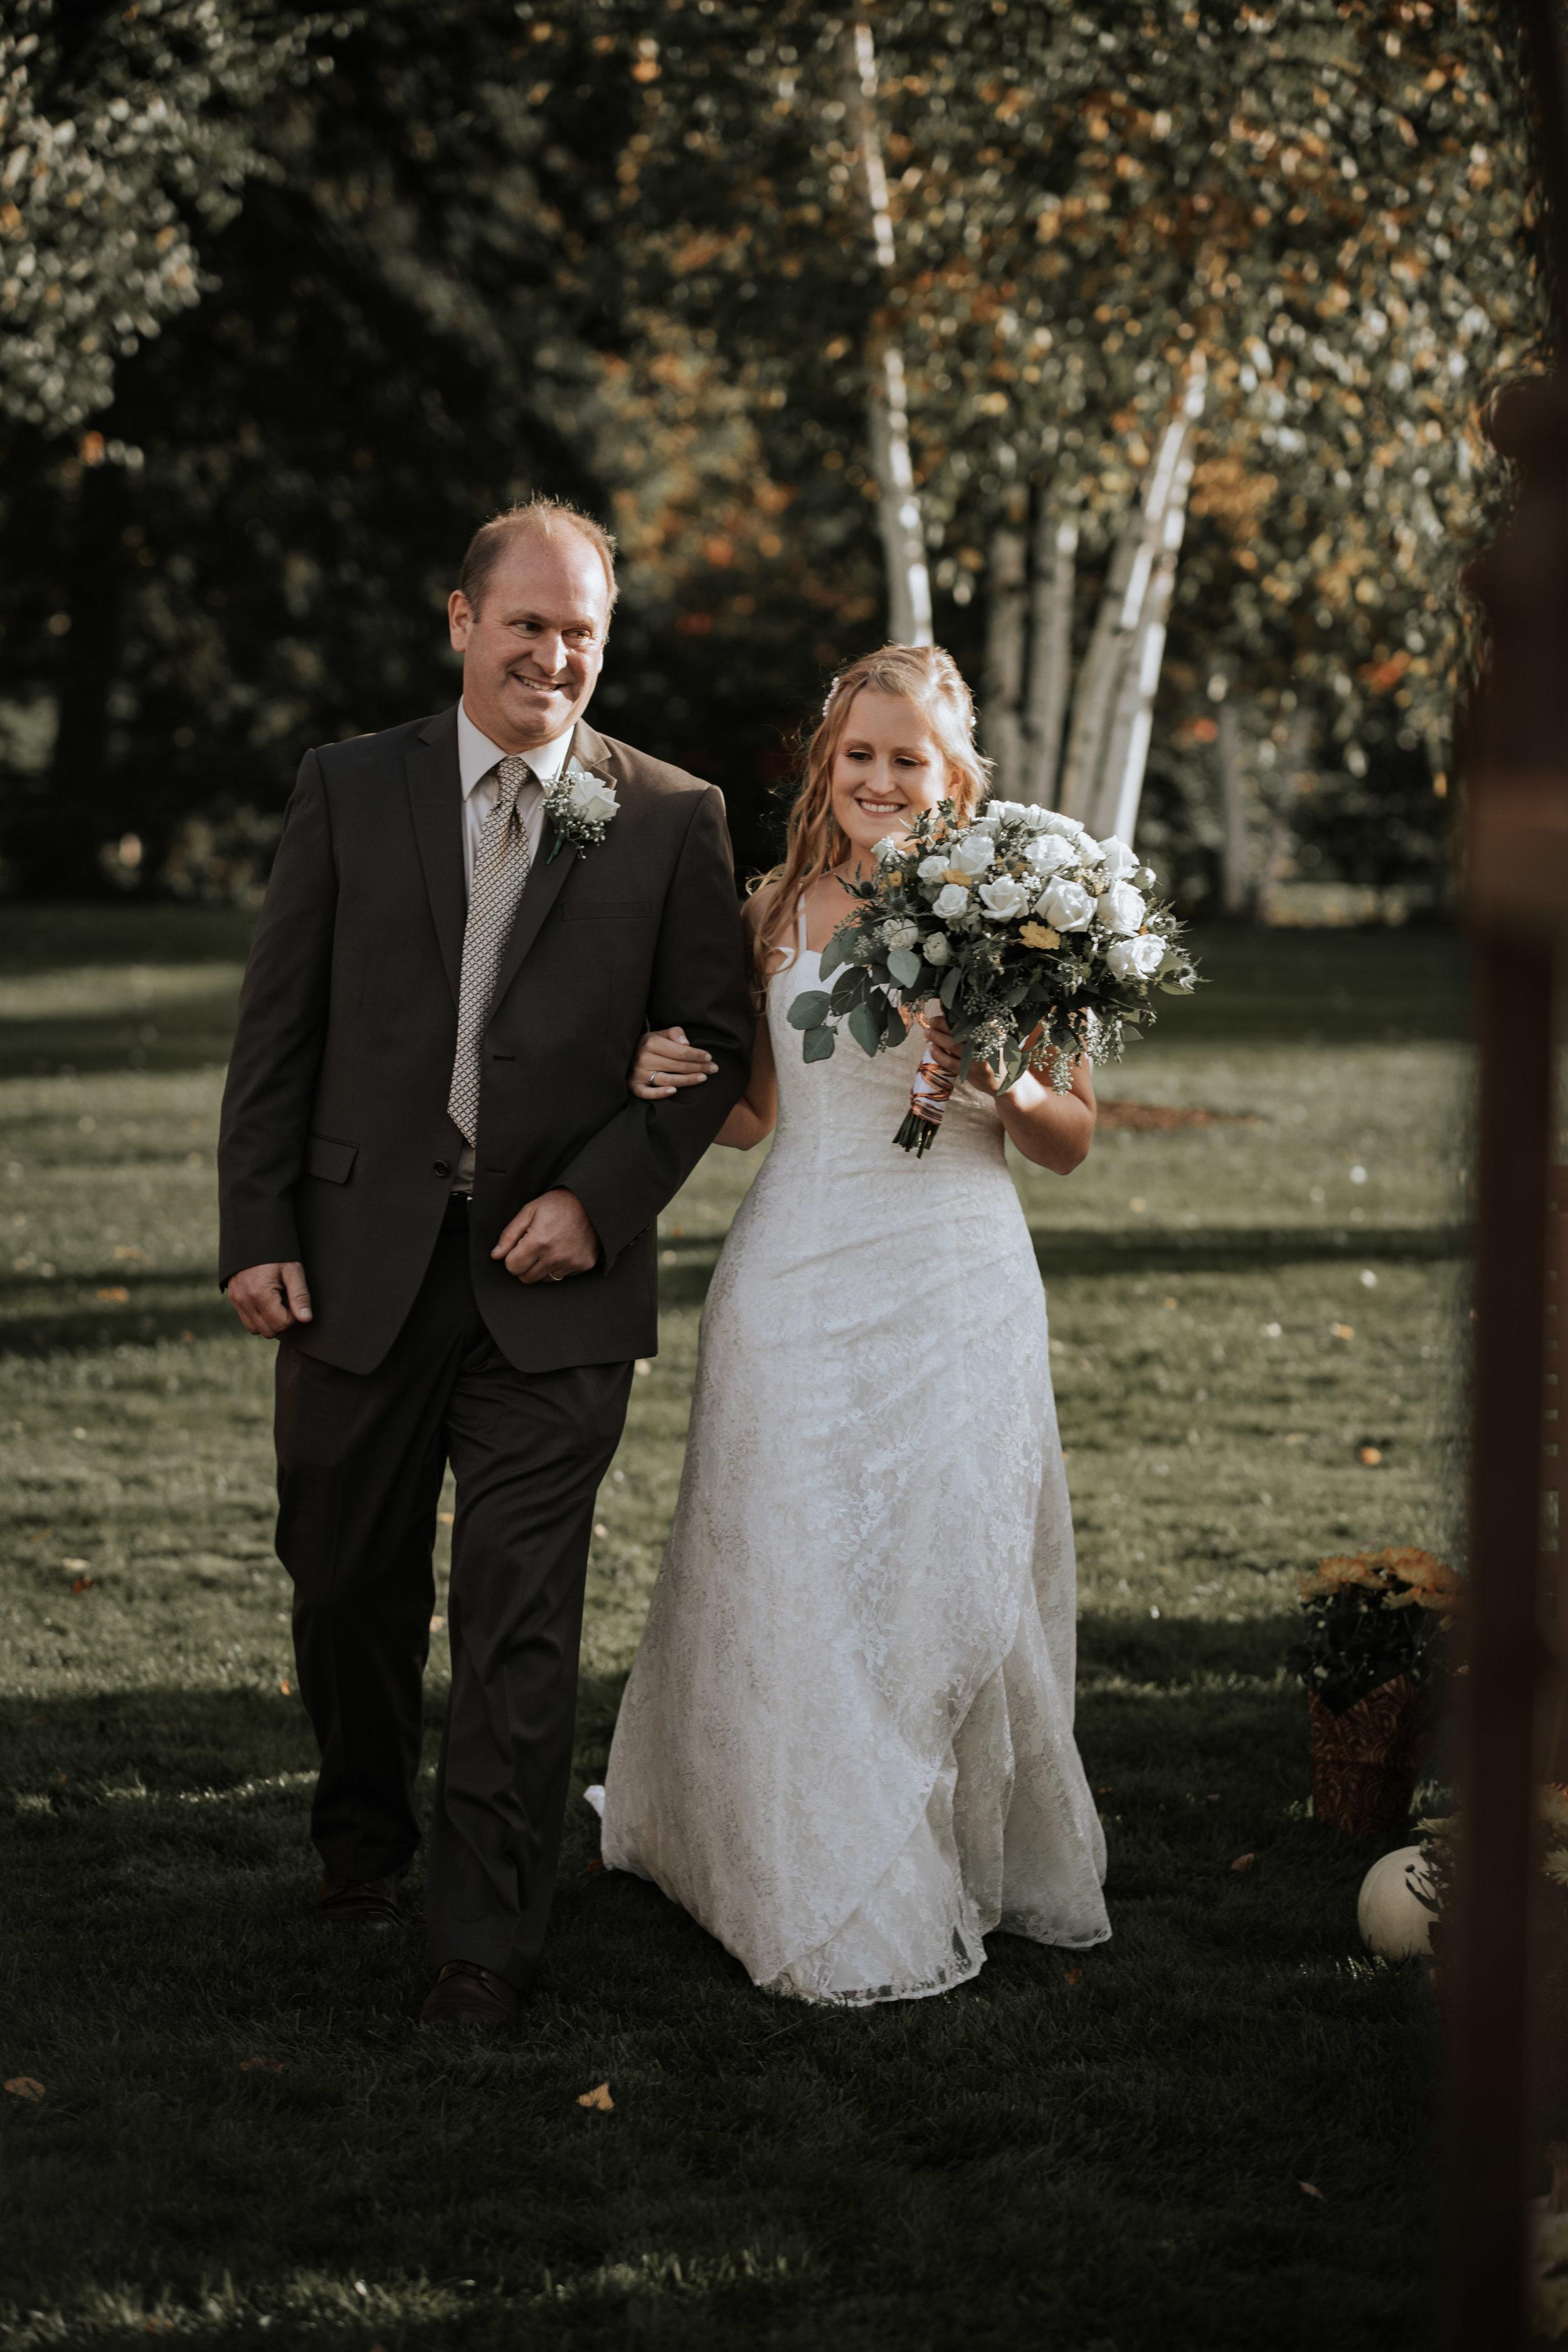 Vermont Wedding | Lorianna Weathers Photography-0496.jpg